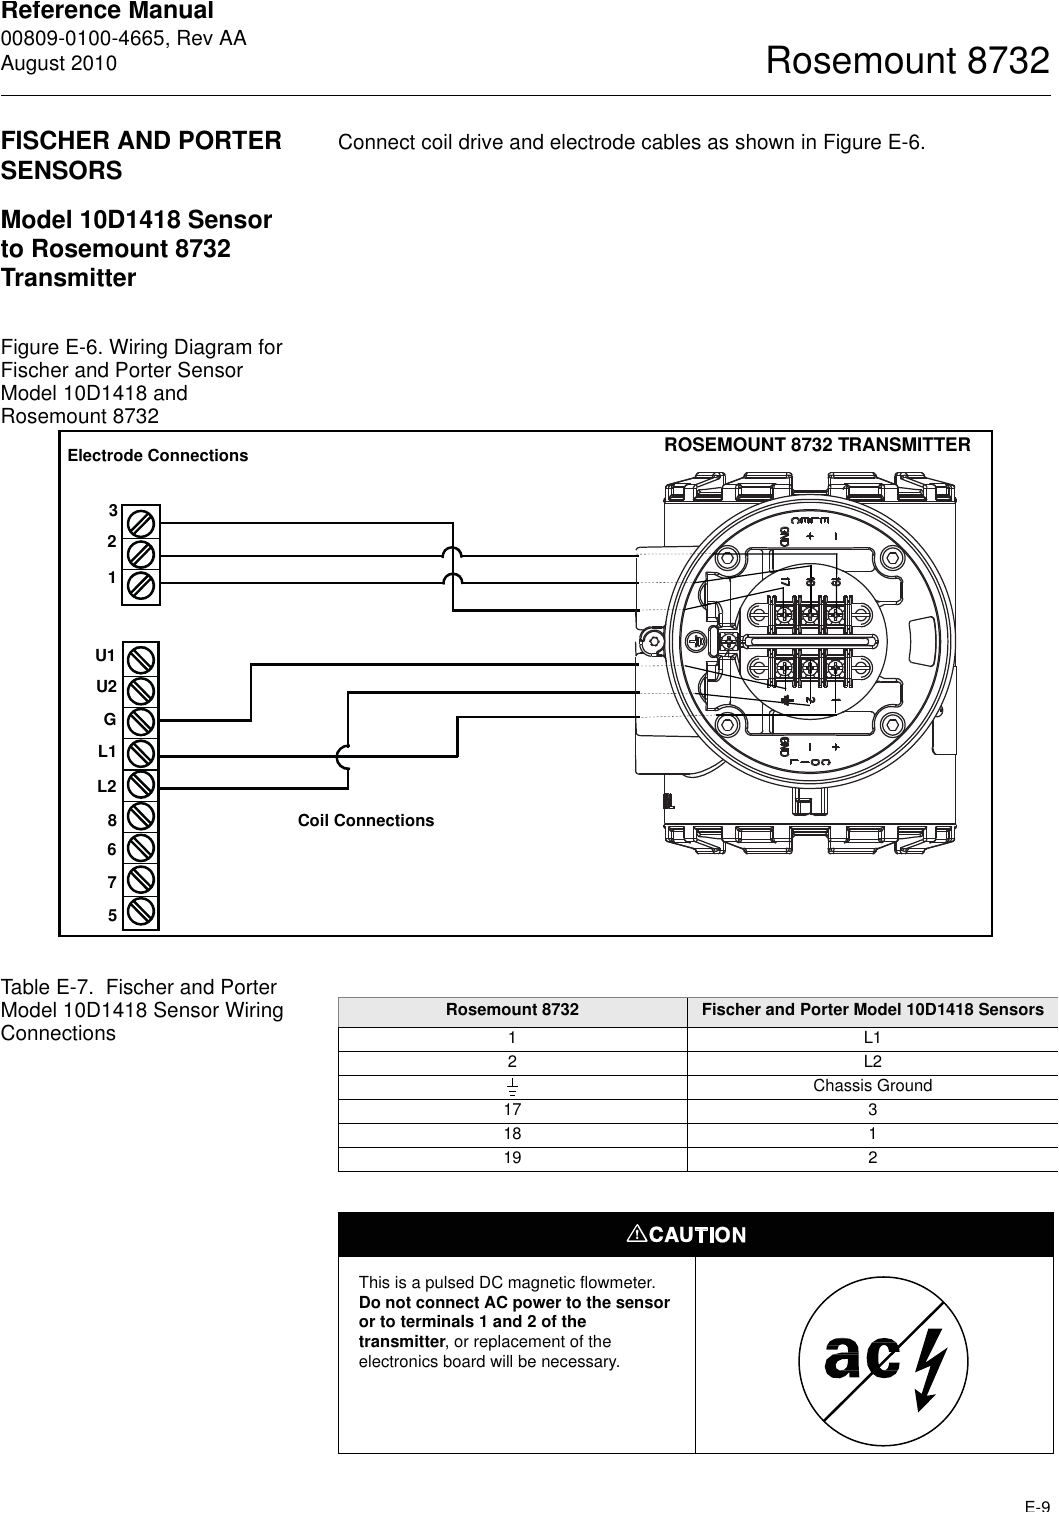 emersonrosemount8732usersmanual165675 30137492 user guide page 135 png